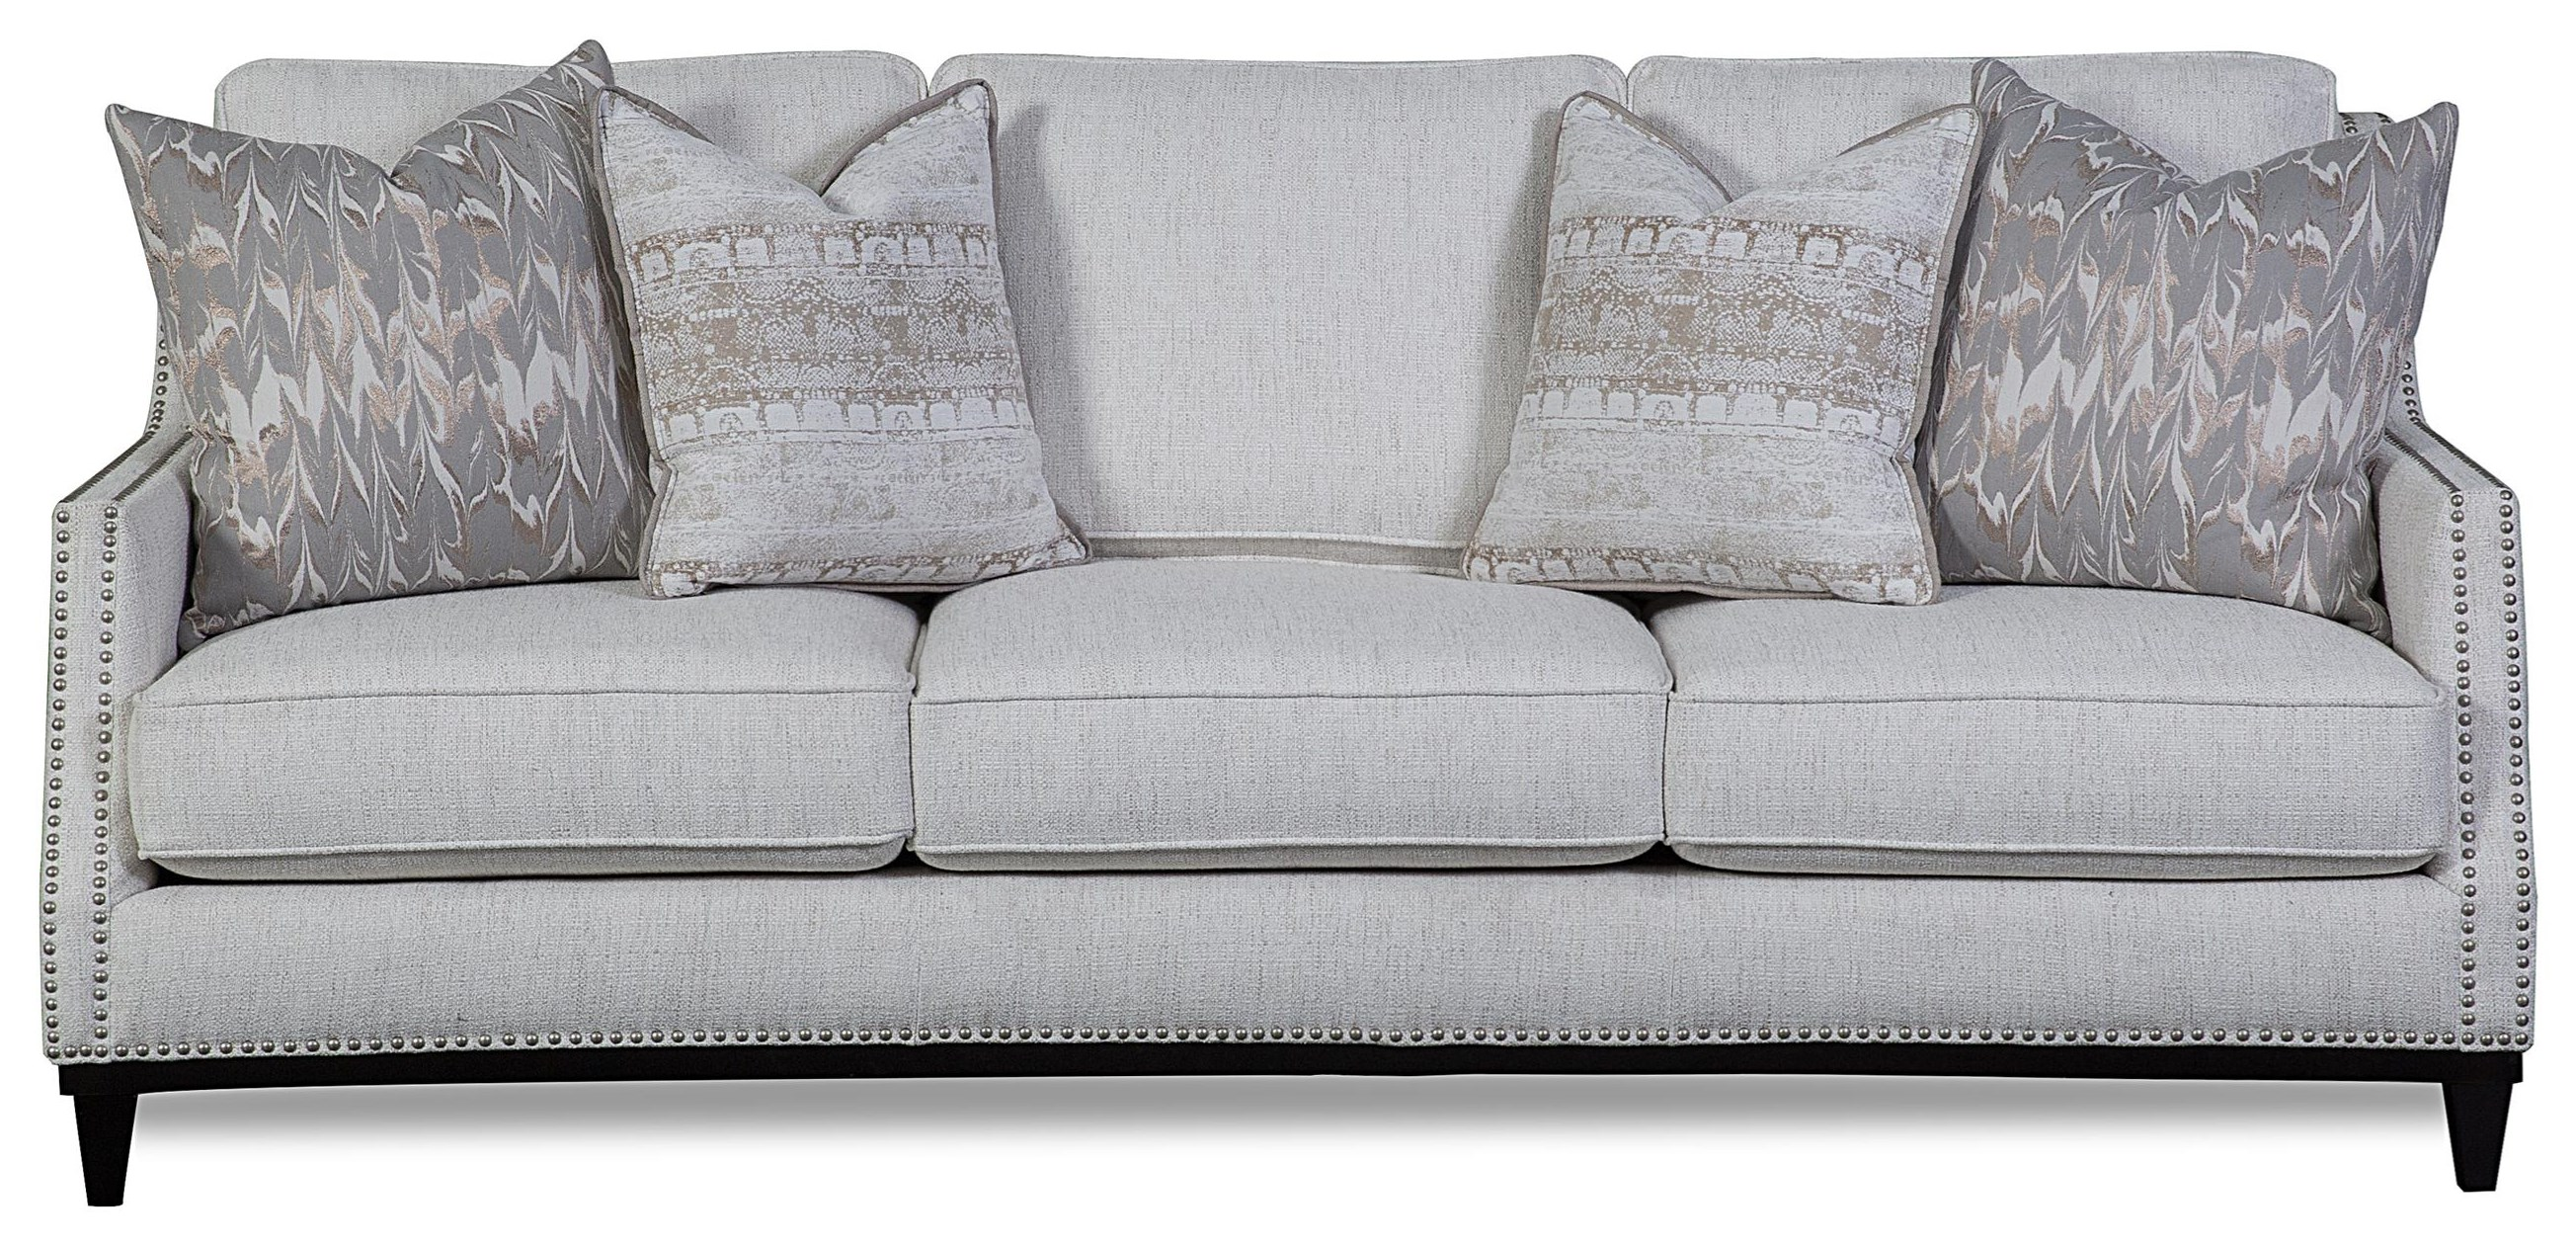 Ava Fresco Sofa by Aria Designs at Stoney Creek Furniture